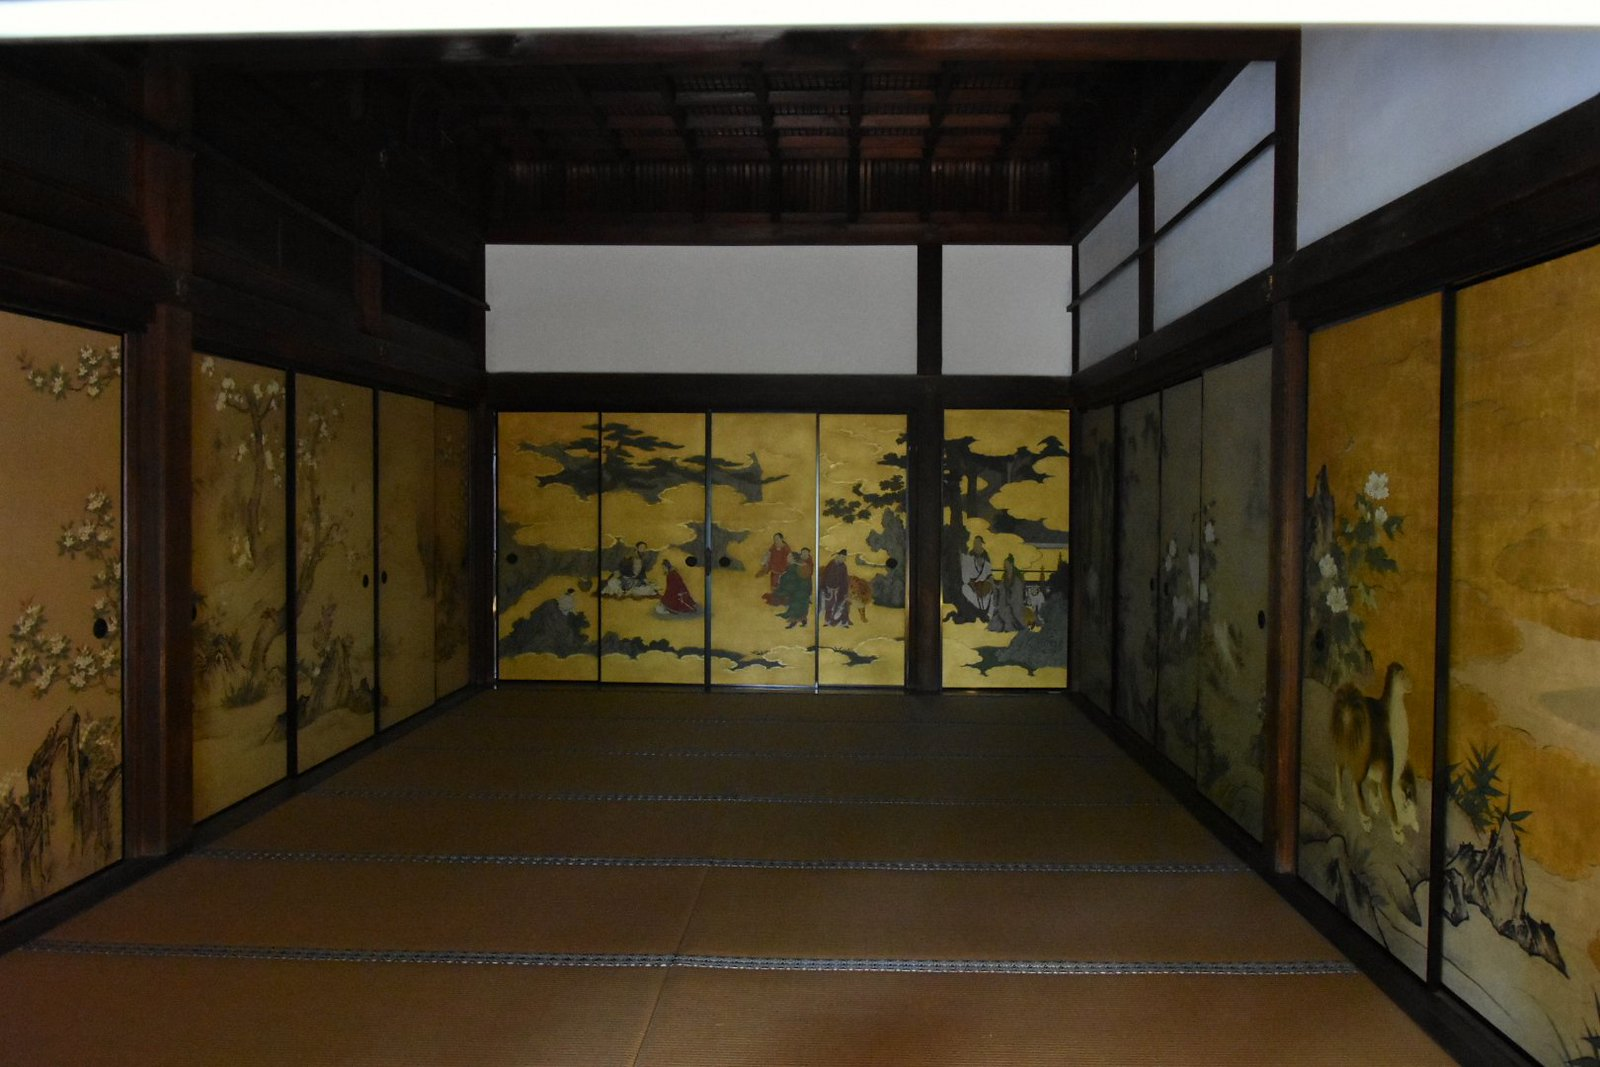 Kyôtô - Nanzen-ji